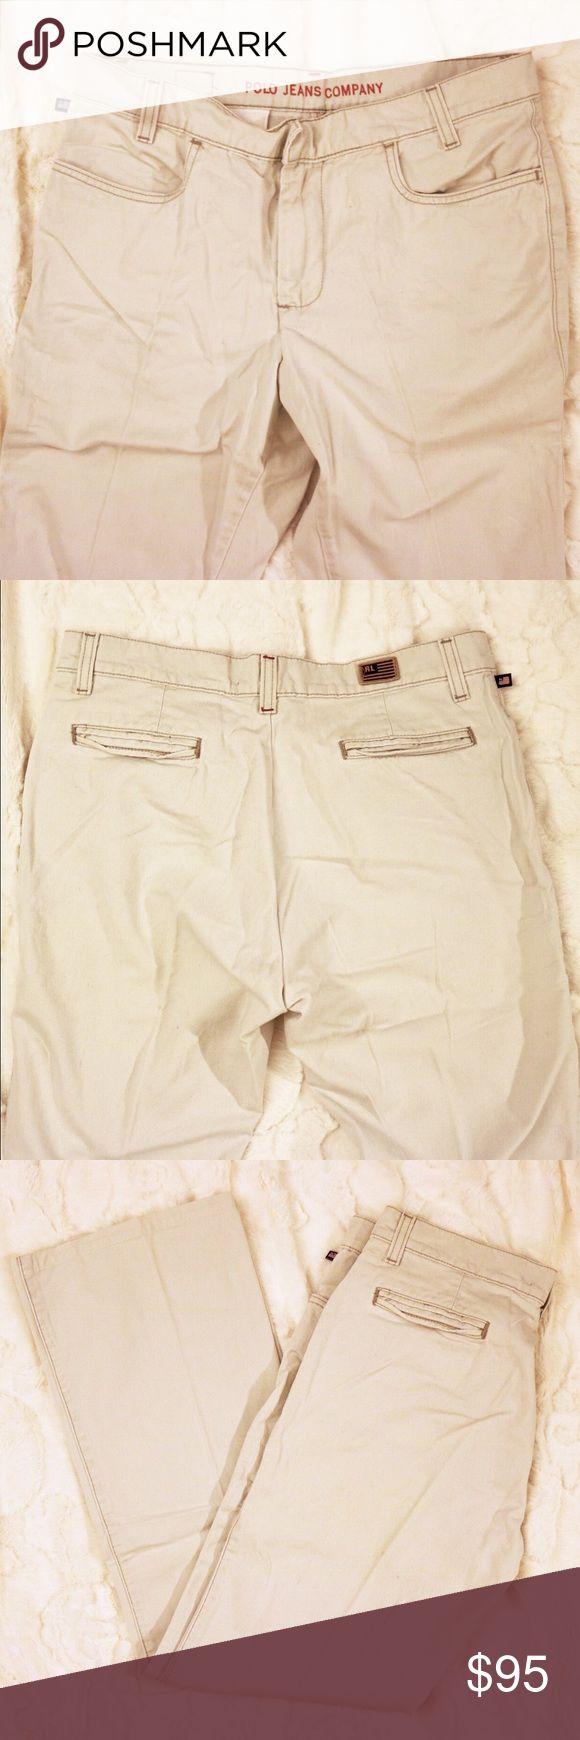 RL Cream Pants Straight leg cream pants with front and back pockets. 6X31. 100% cotton Ralph Lauren Pants Straight Leg